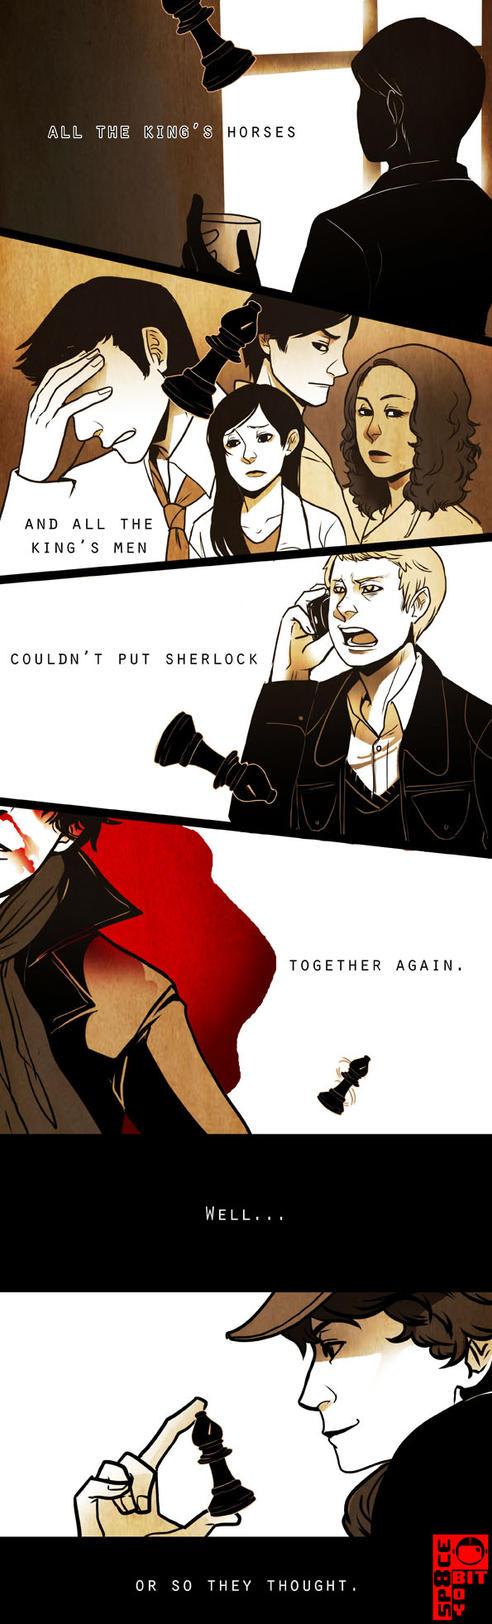 Sherlock: The Finale Tale by Shilloshilloh